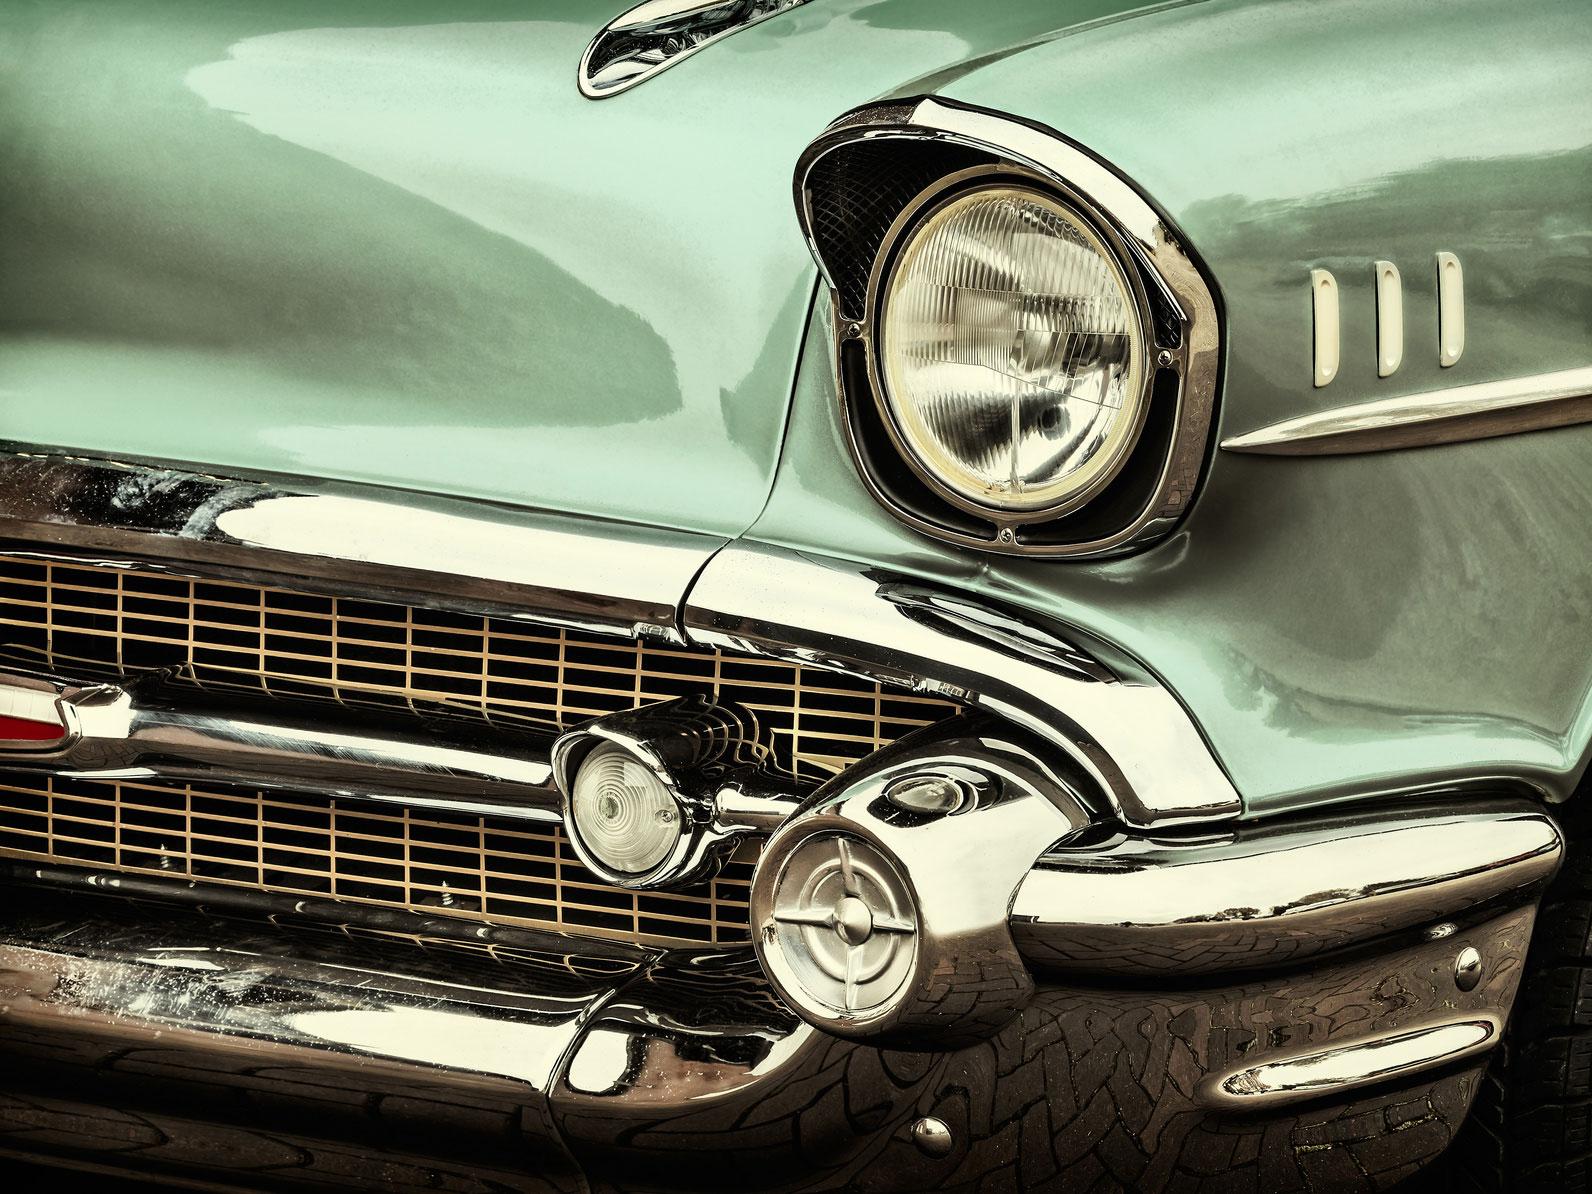 Maintaining your antique car Orland park IL